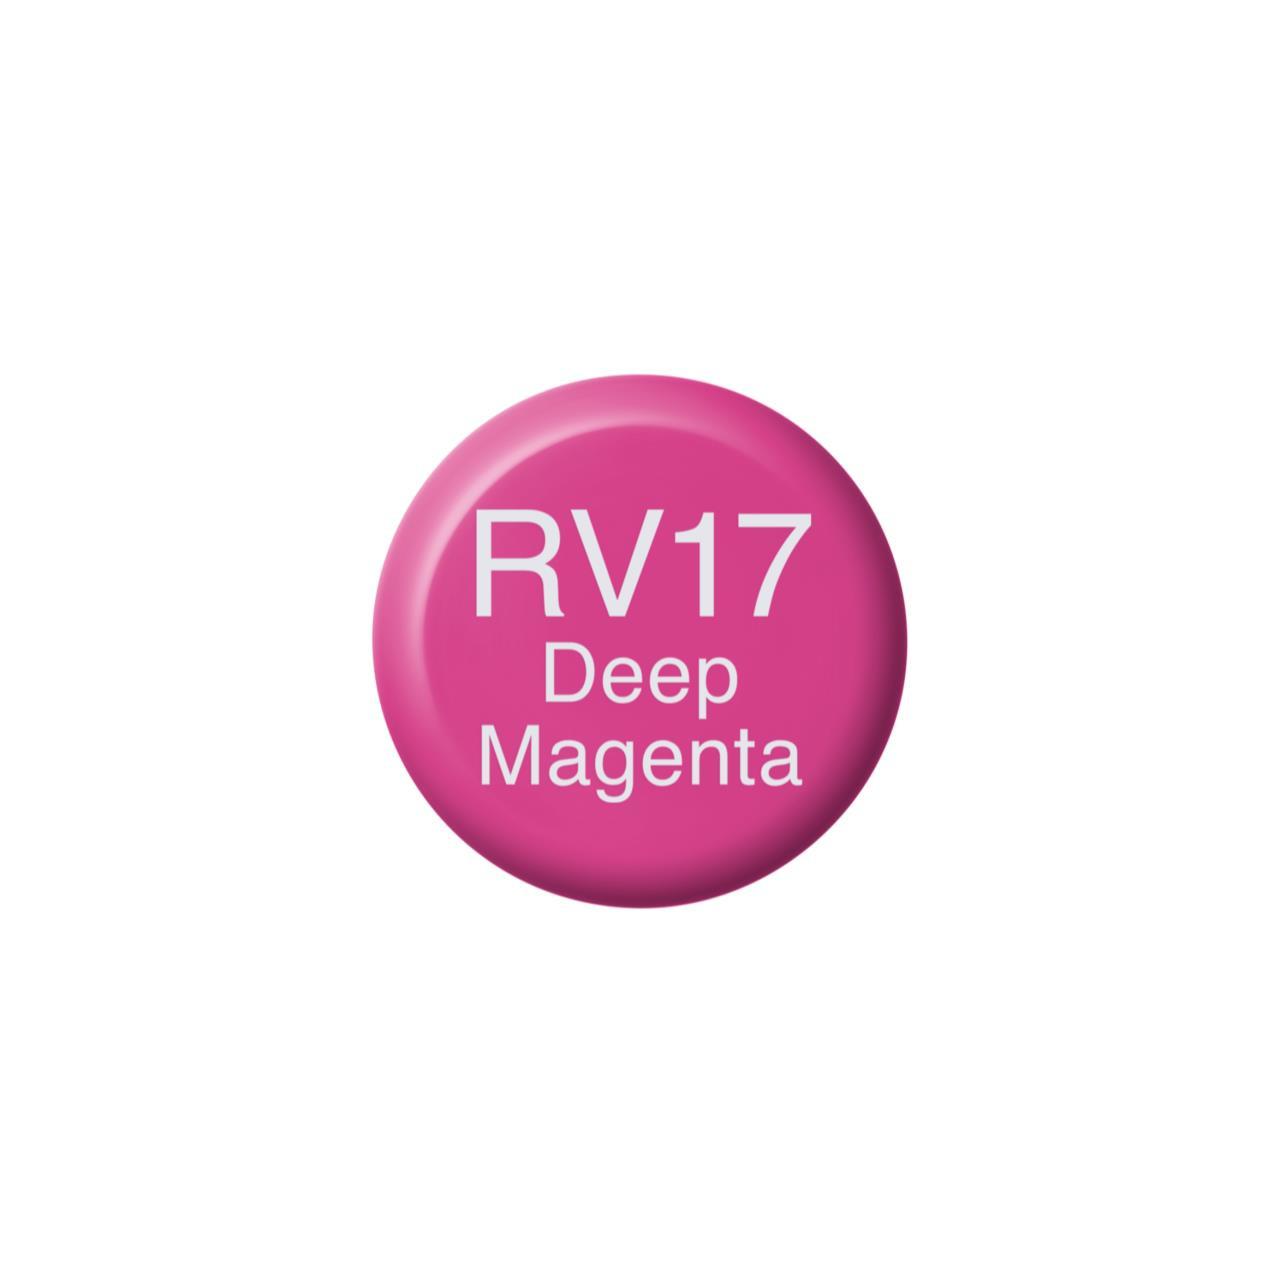 RV17 Deep Magneta, Copic Ink - 4511338057773